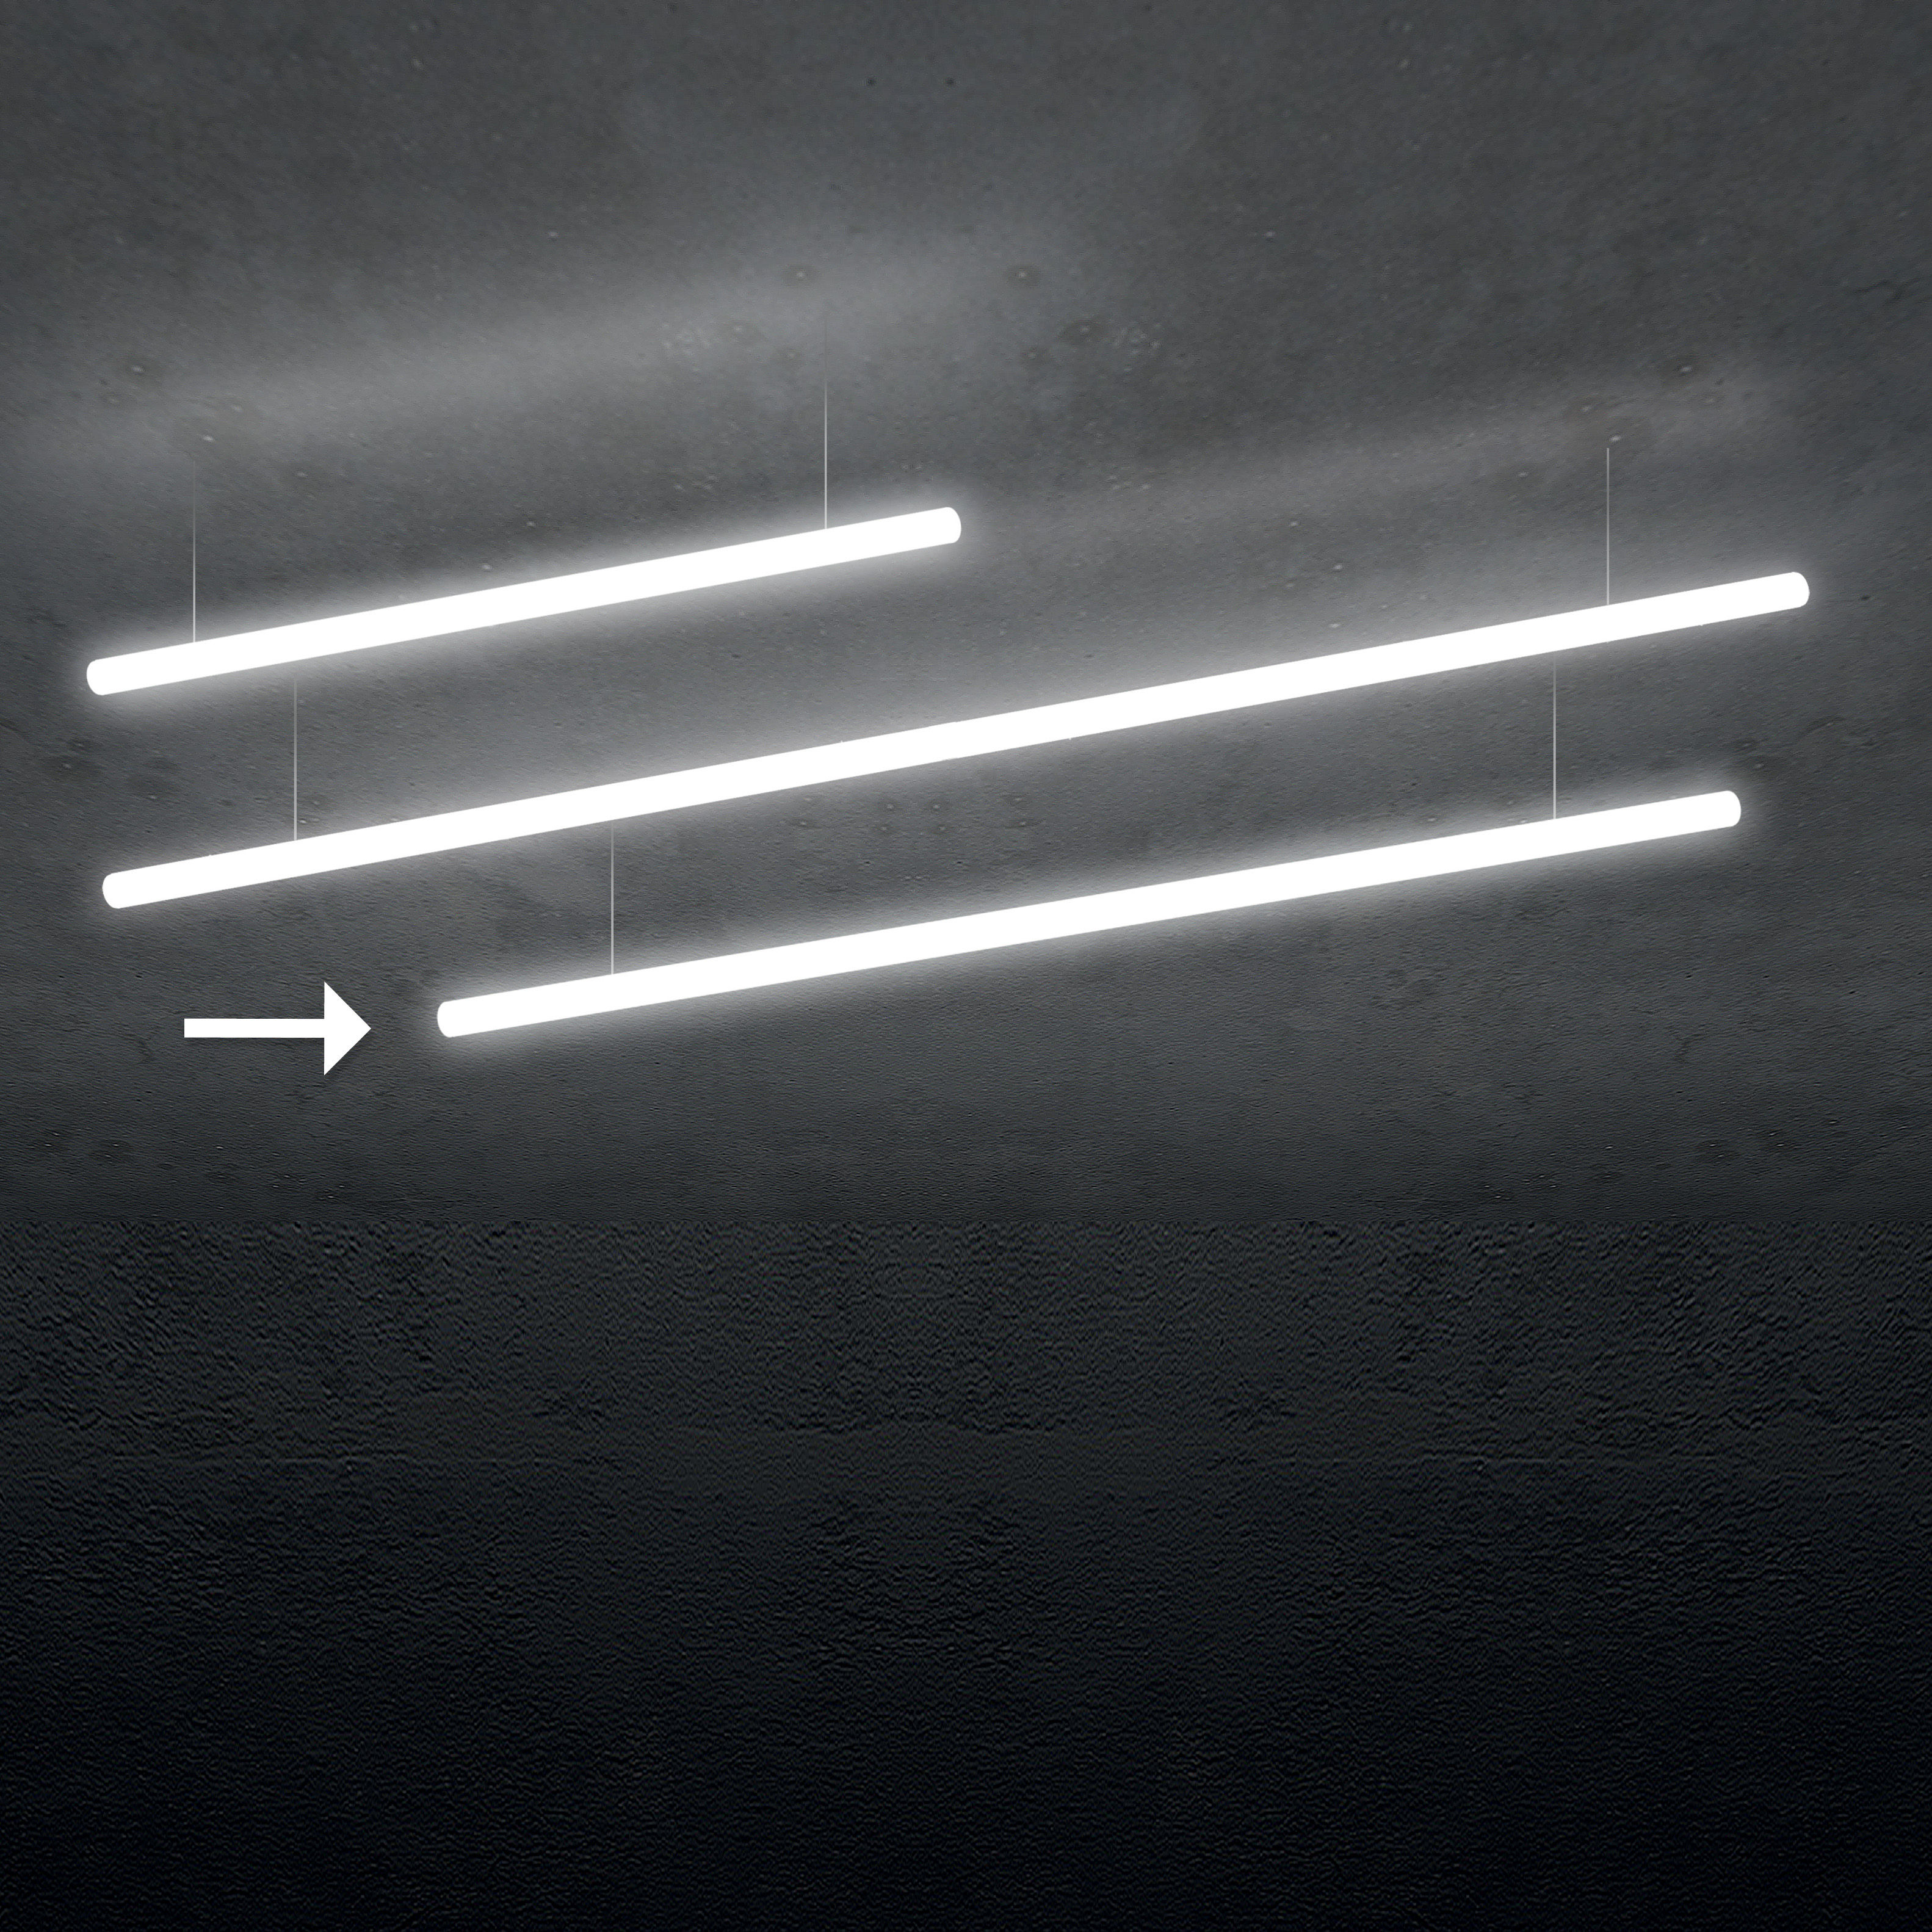 Illuminazione - Lampadari - Sospensione Alphabet of light Linear - / Bluetooth - L 180 cm di Artemide - L 180 cm / Bianco - Alluminio, Metacrilato